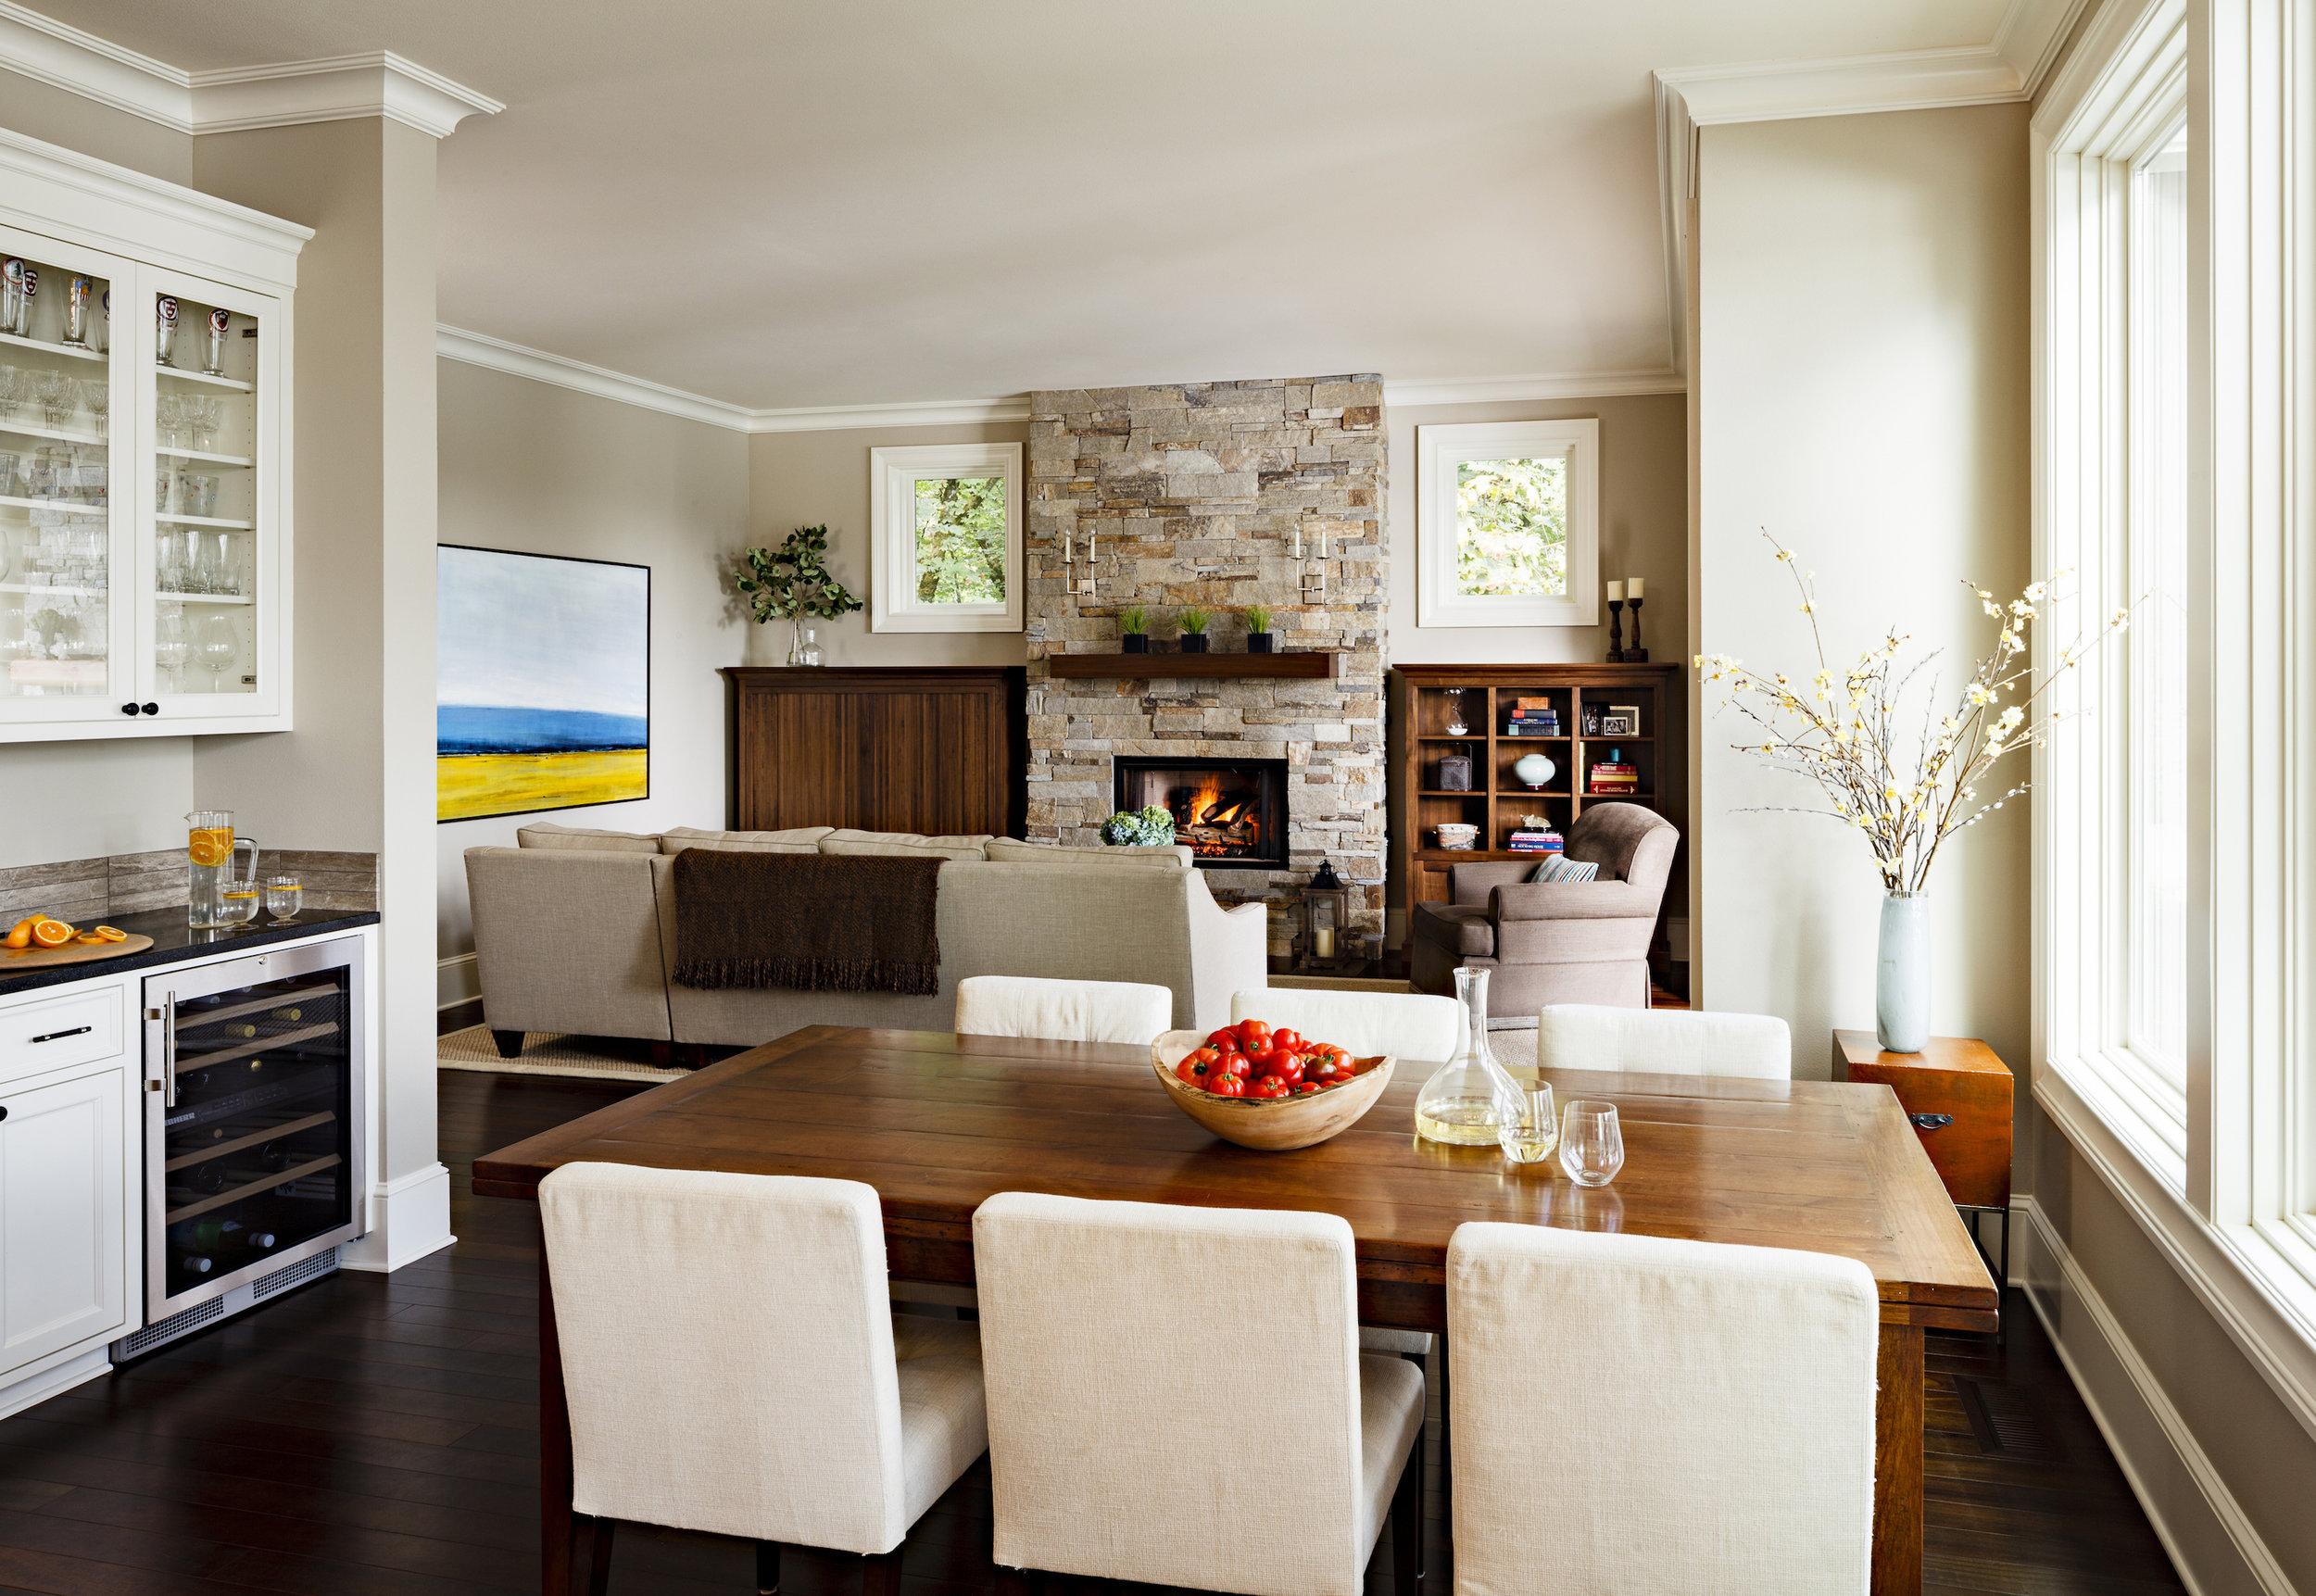 Dining room interior design by Jenni Leasia Interior Design in Portland